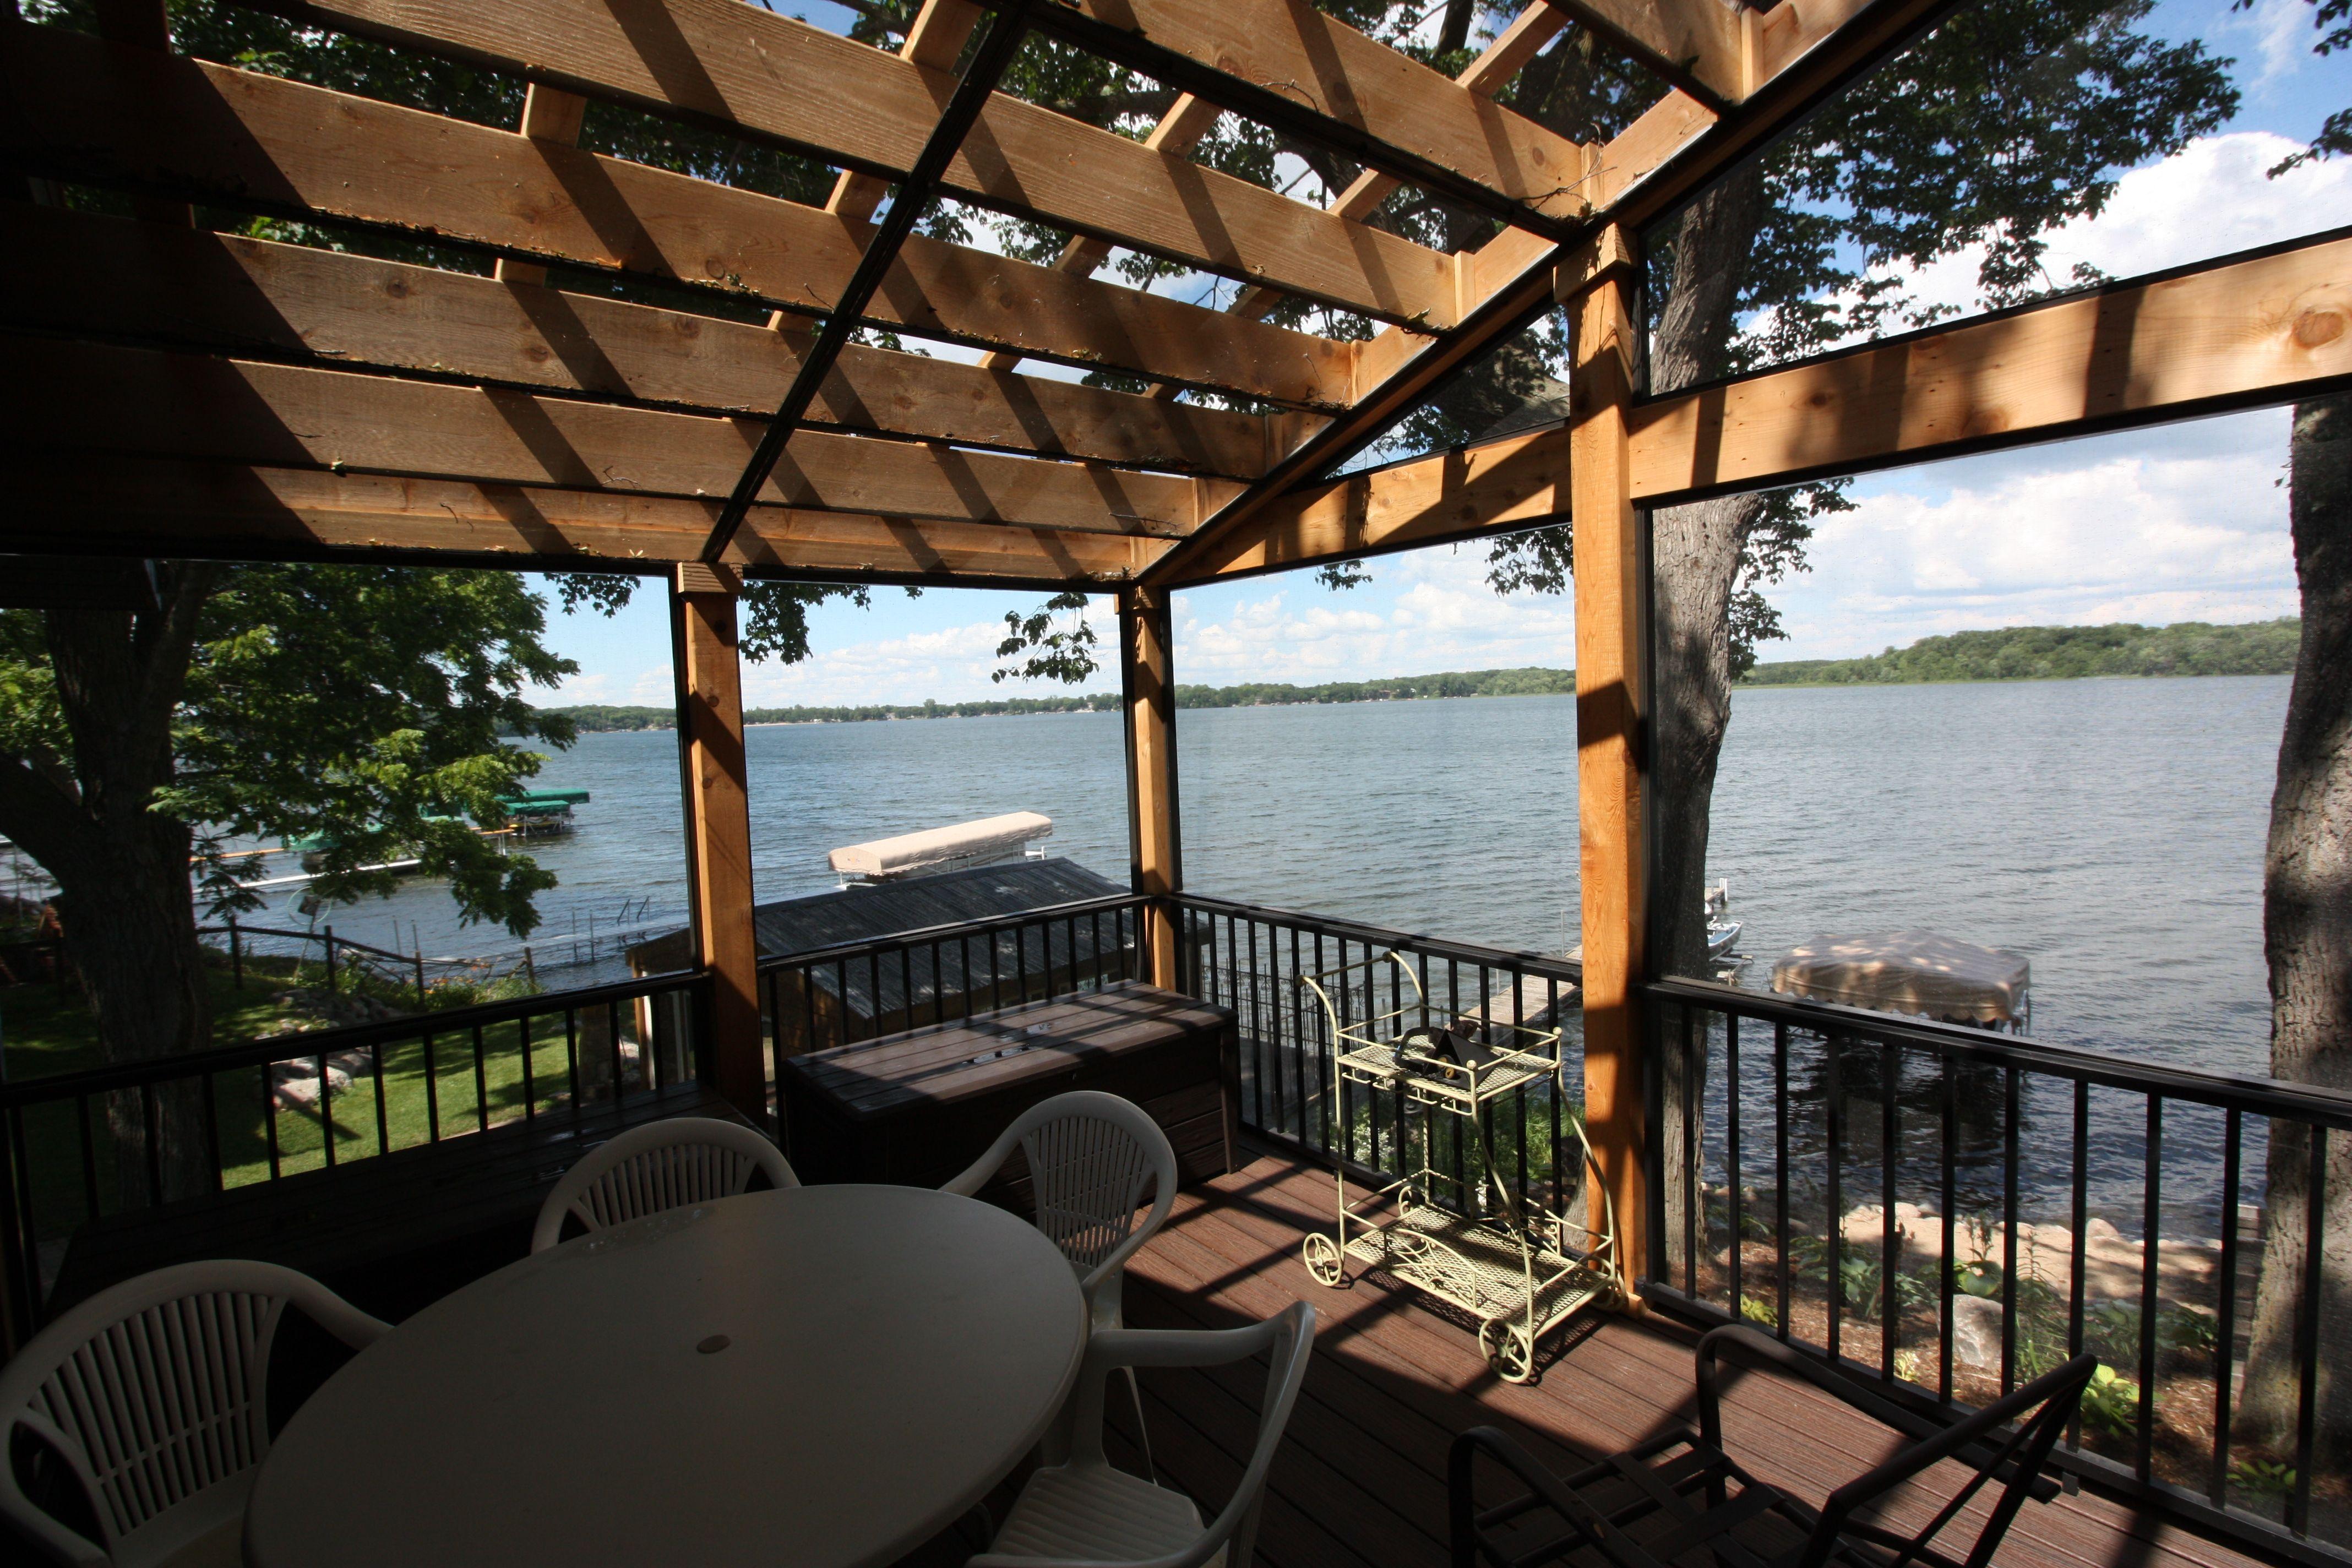 Cedar Screen Porch With Aluminum Railing, Matching Aluminum Screen Framing